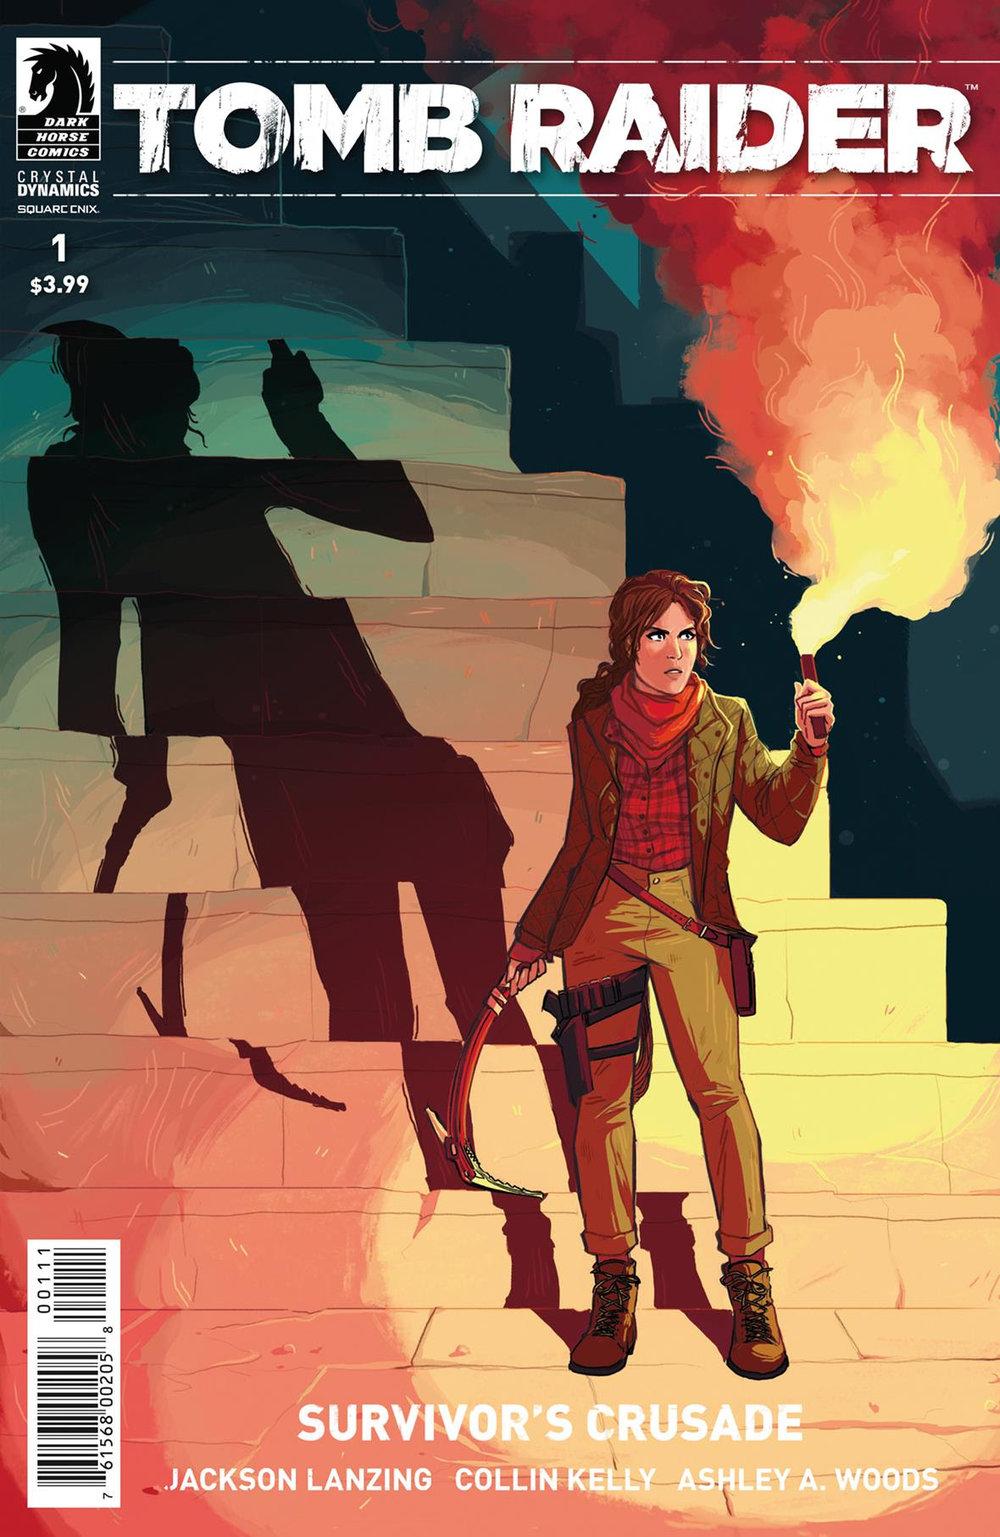 Tomb Raider - Survivors Crusade.jpg